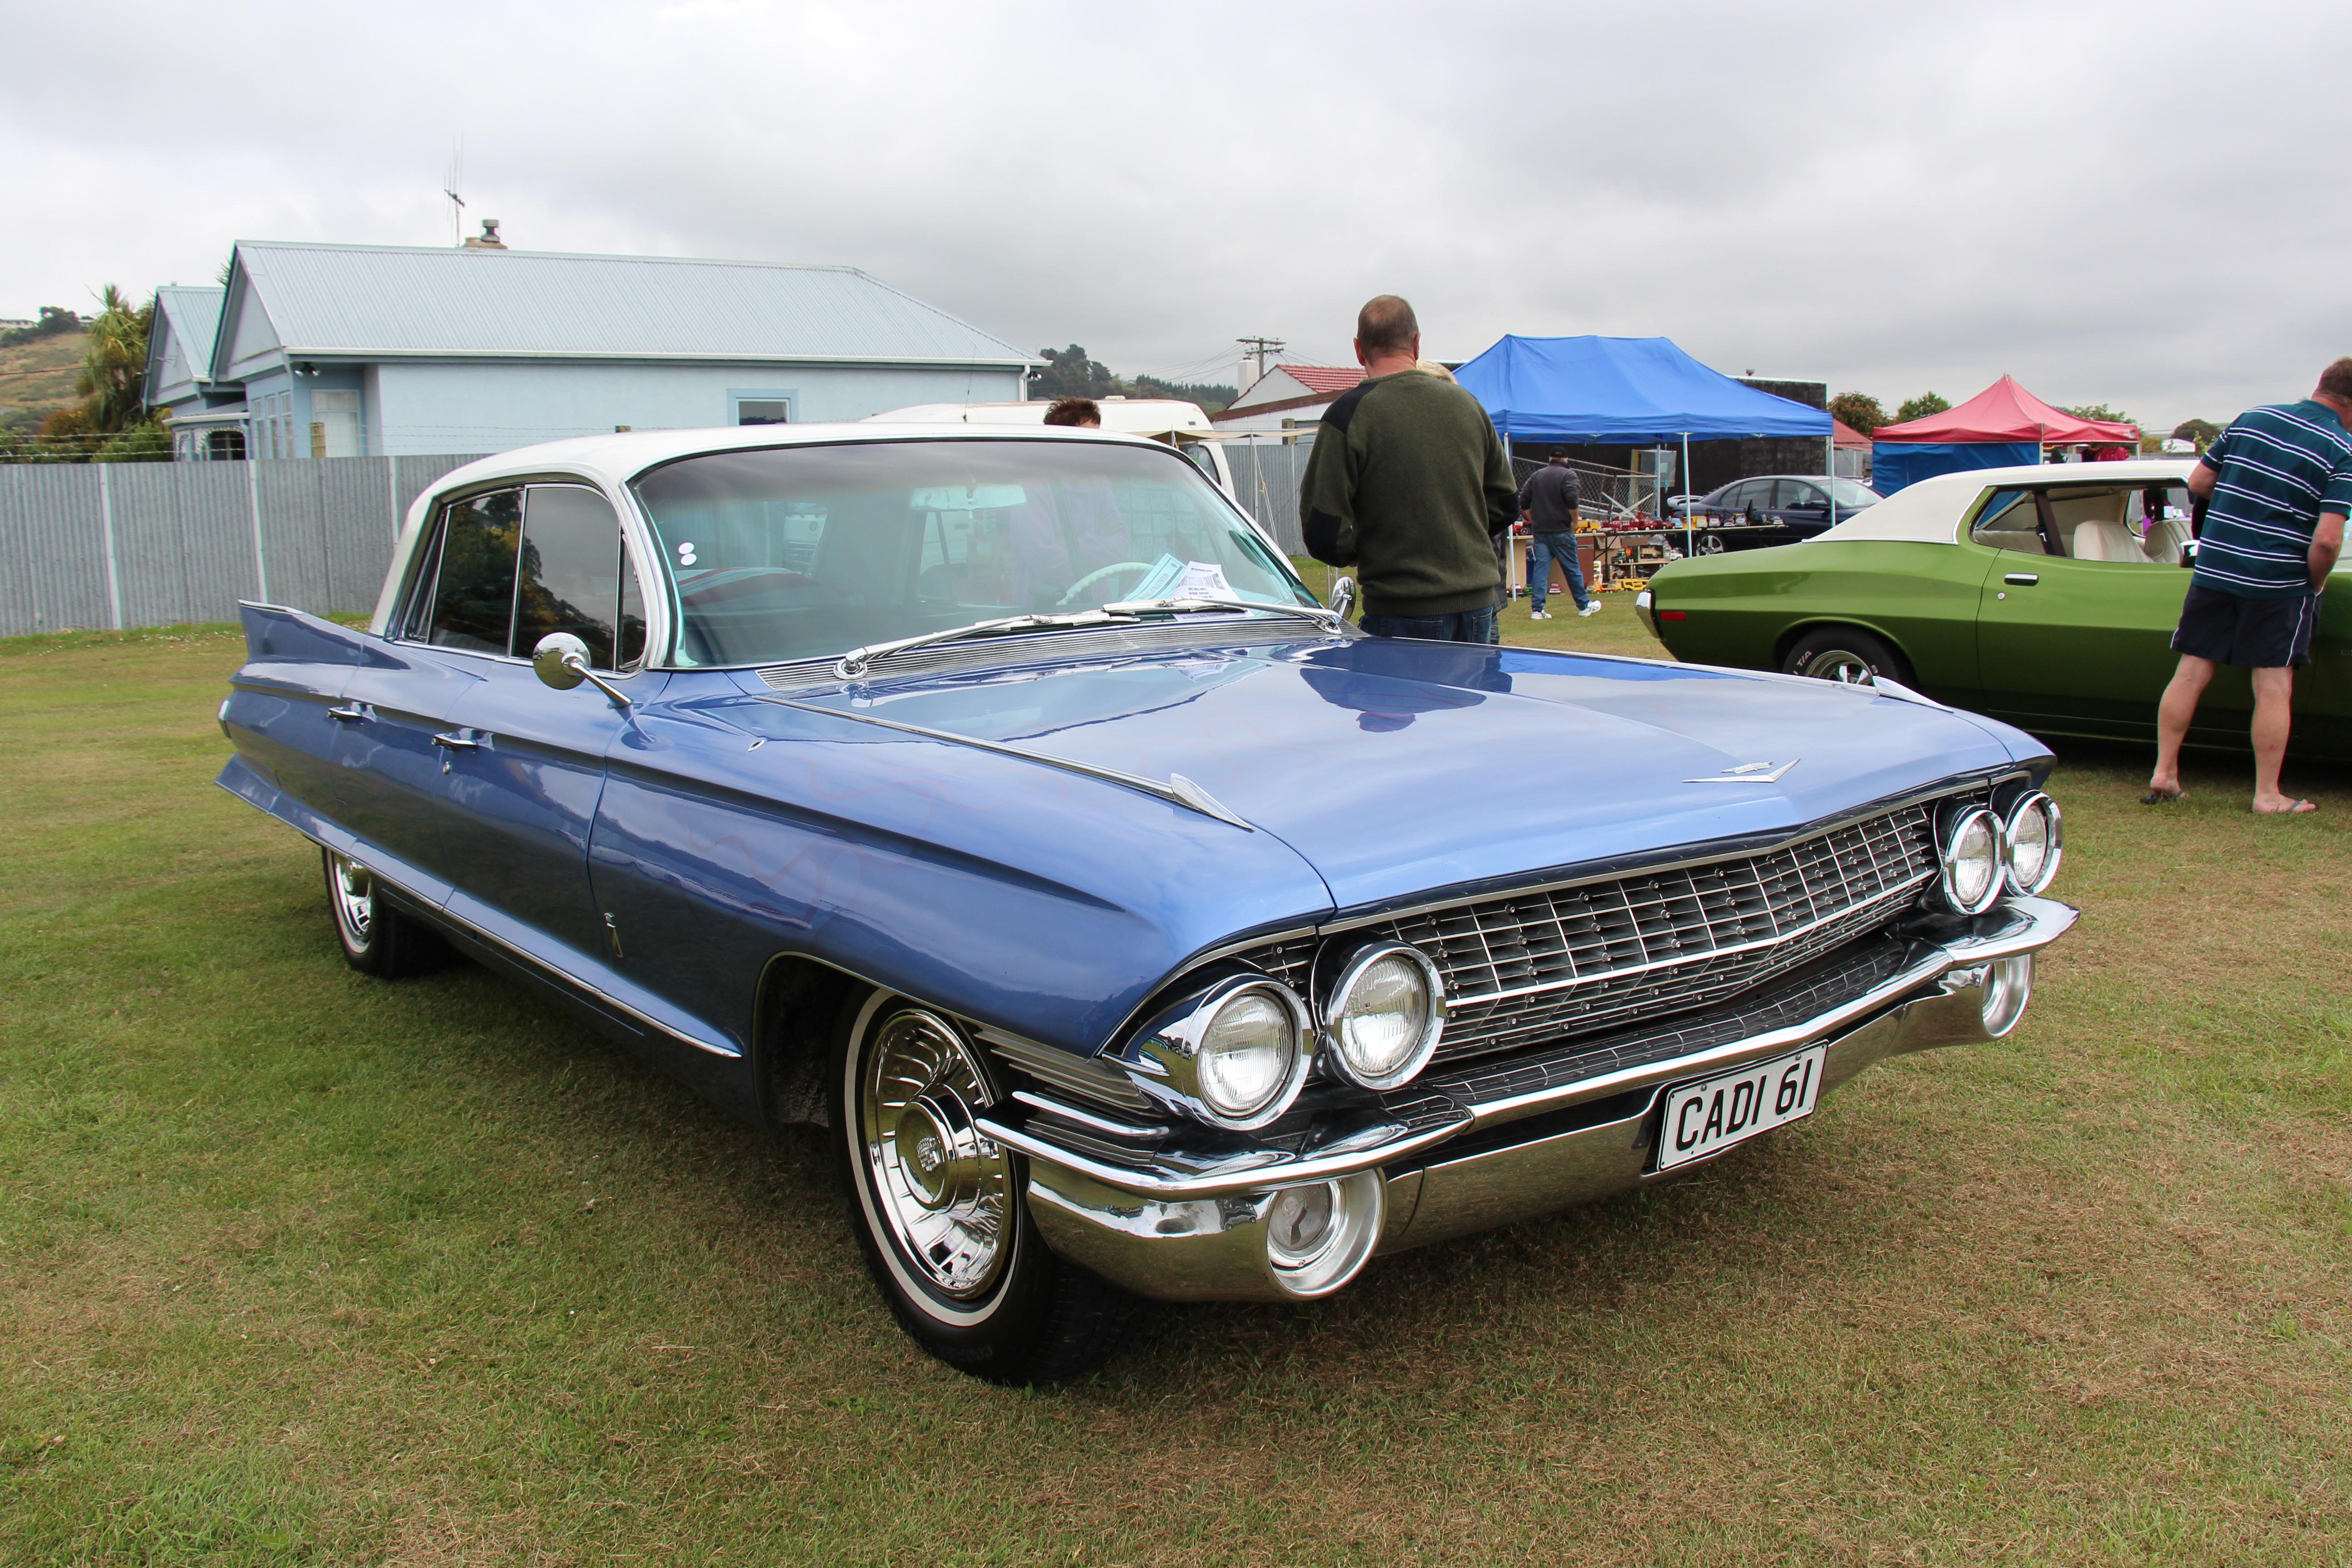 File:1961 Cadillac Fleetwood 60 Special (15920259175).jpg ...